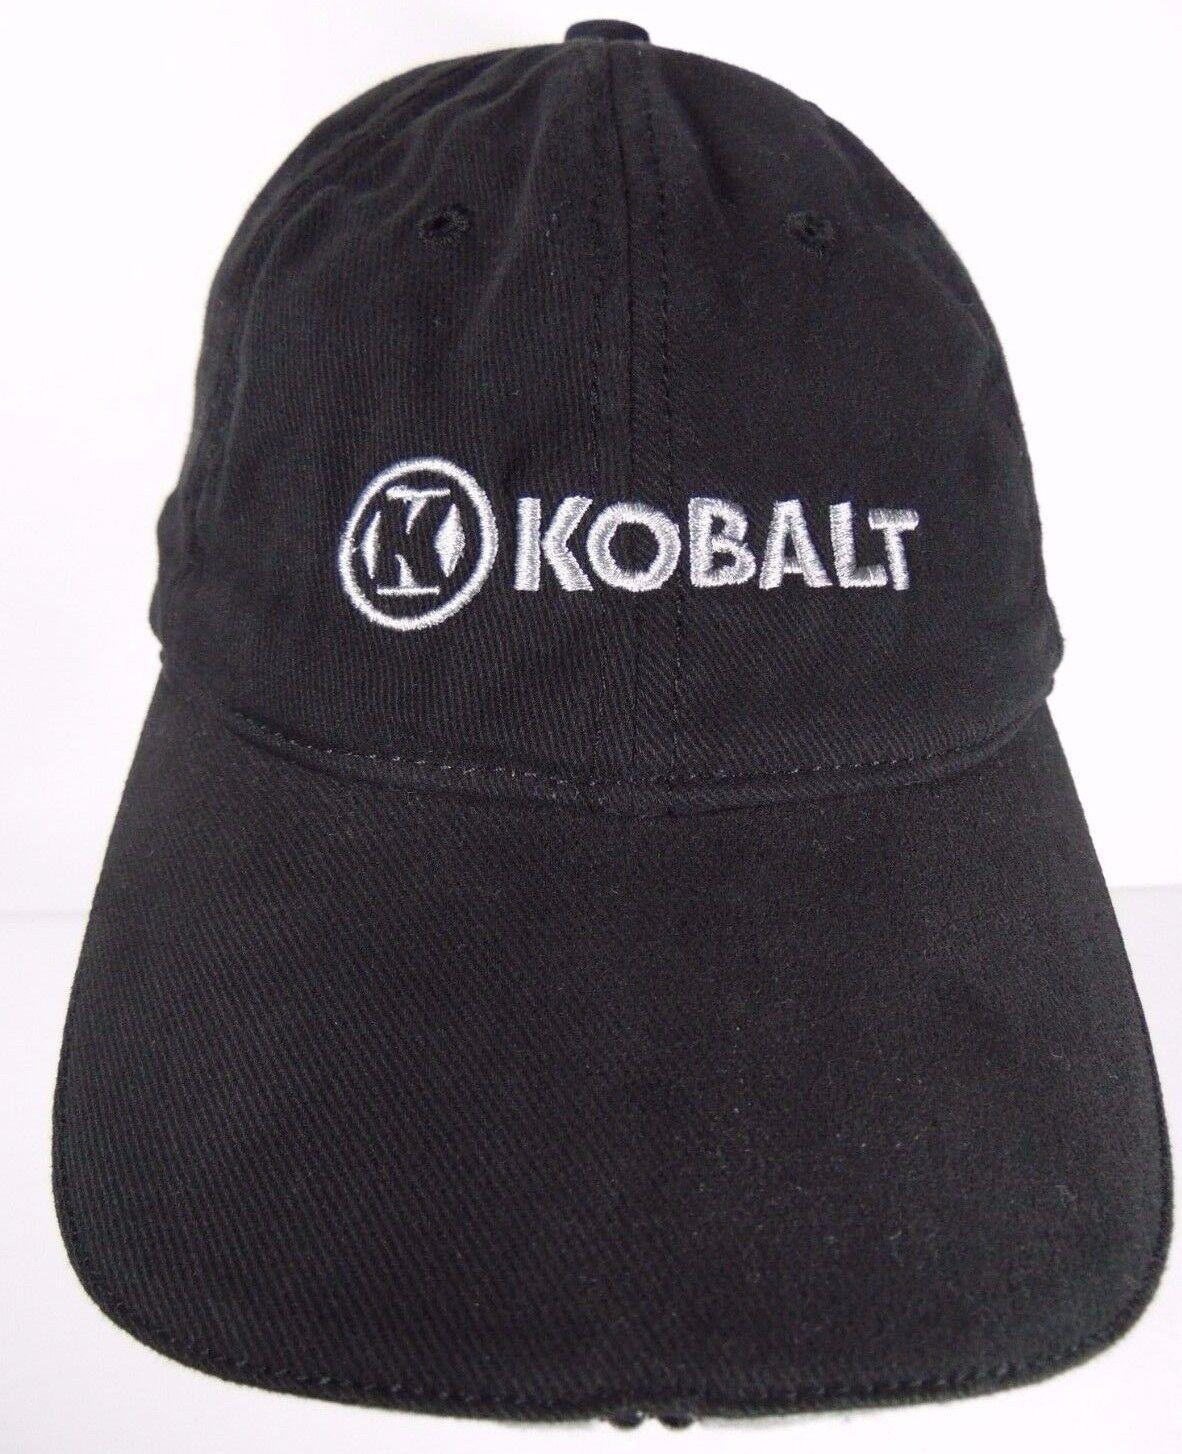 KOBALT TOOLS LOGO HAND TOOLS POWER ADVERTISING TOOLS TOOL STORAGE BLACK ADVERTISING POWER HAT CAP 3a68fc